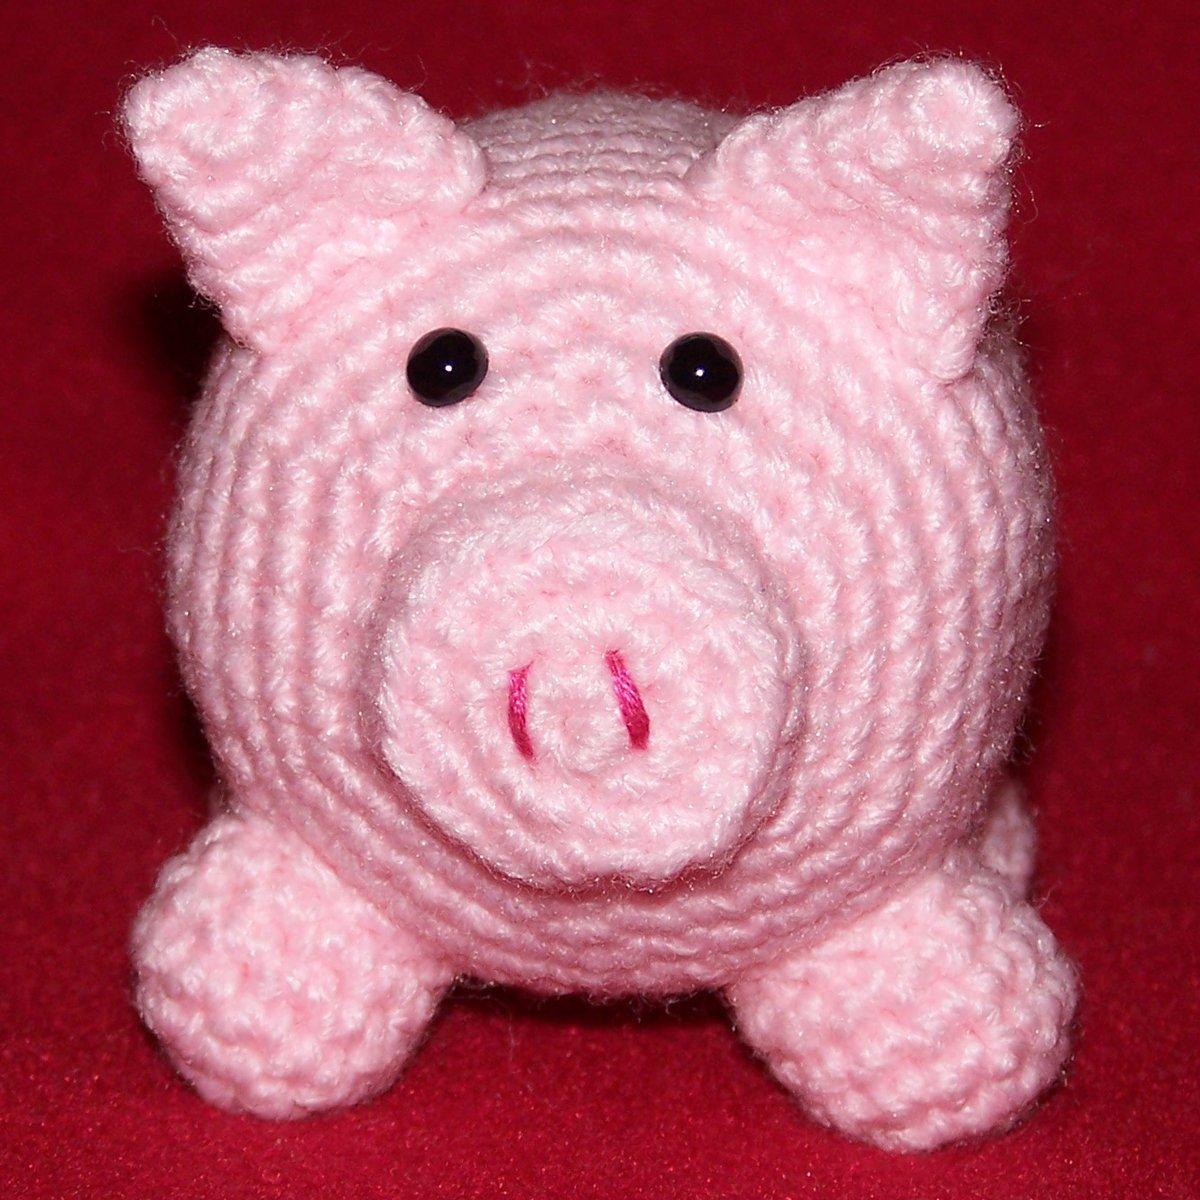 amigurumi PIG - pink - cute crochet stuffed toy animal